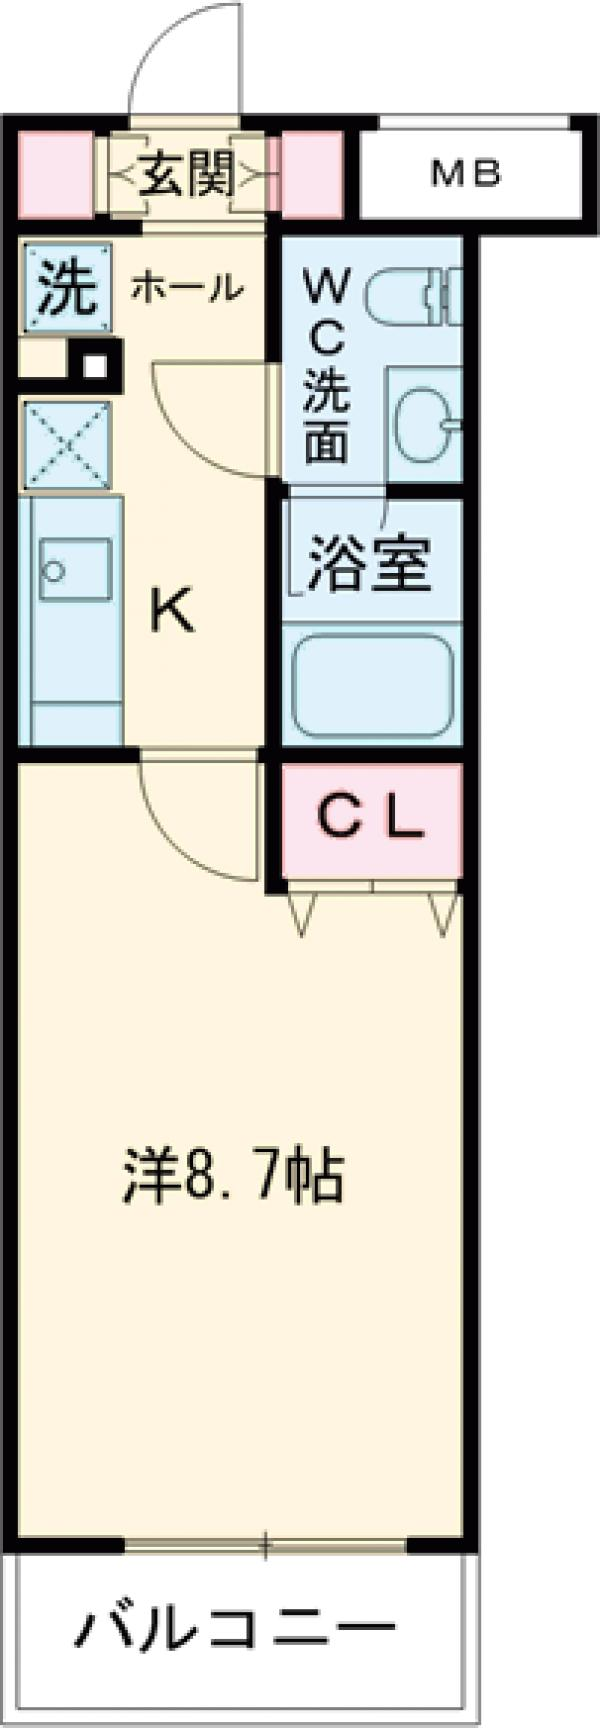 AZEST西高島平・106号室の間取り